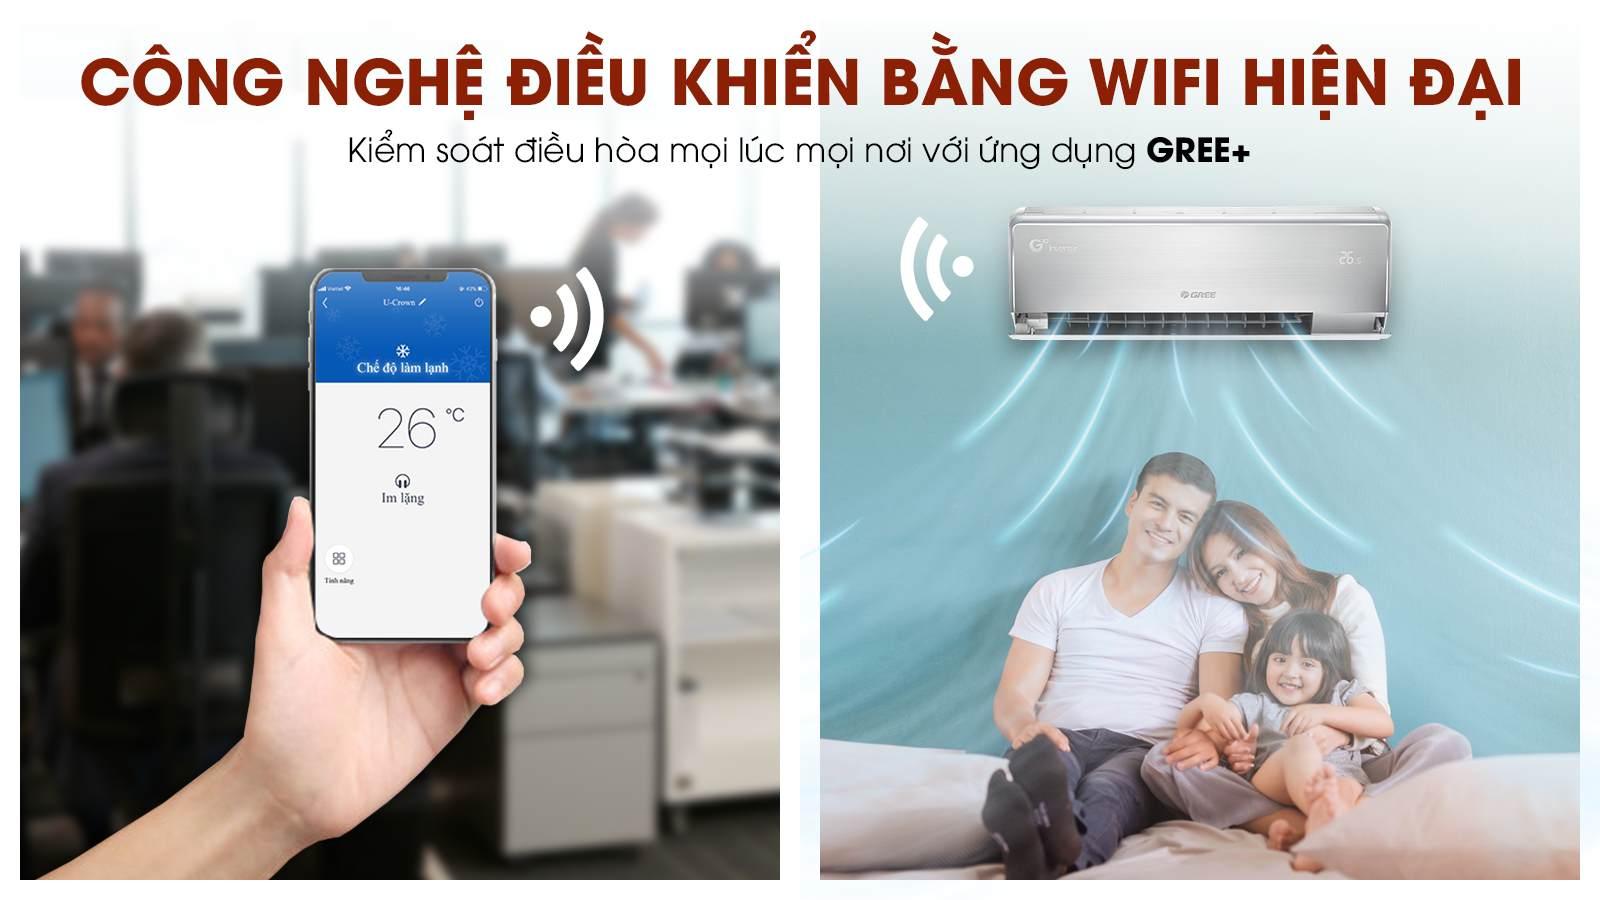 GWC09UB-S6D9A4A, kết nối Wifi